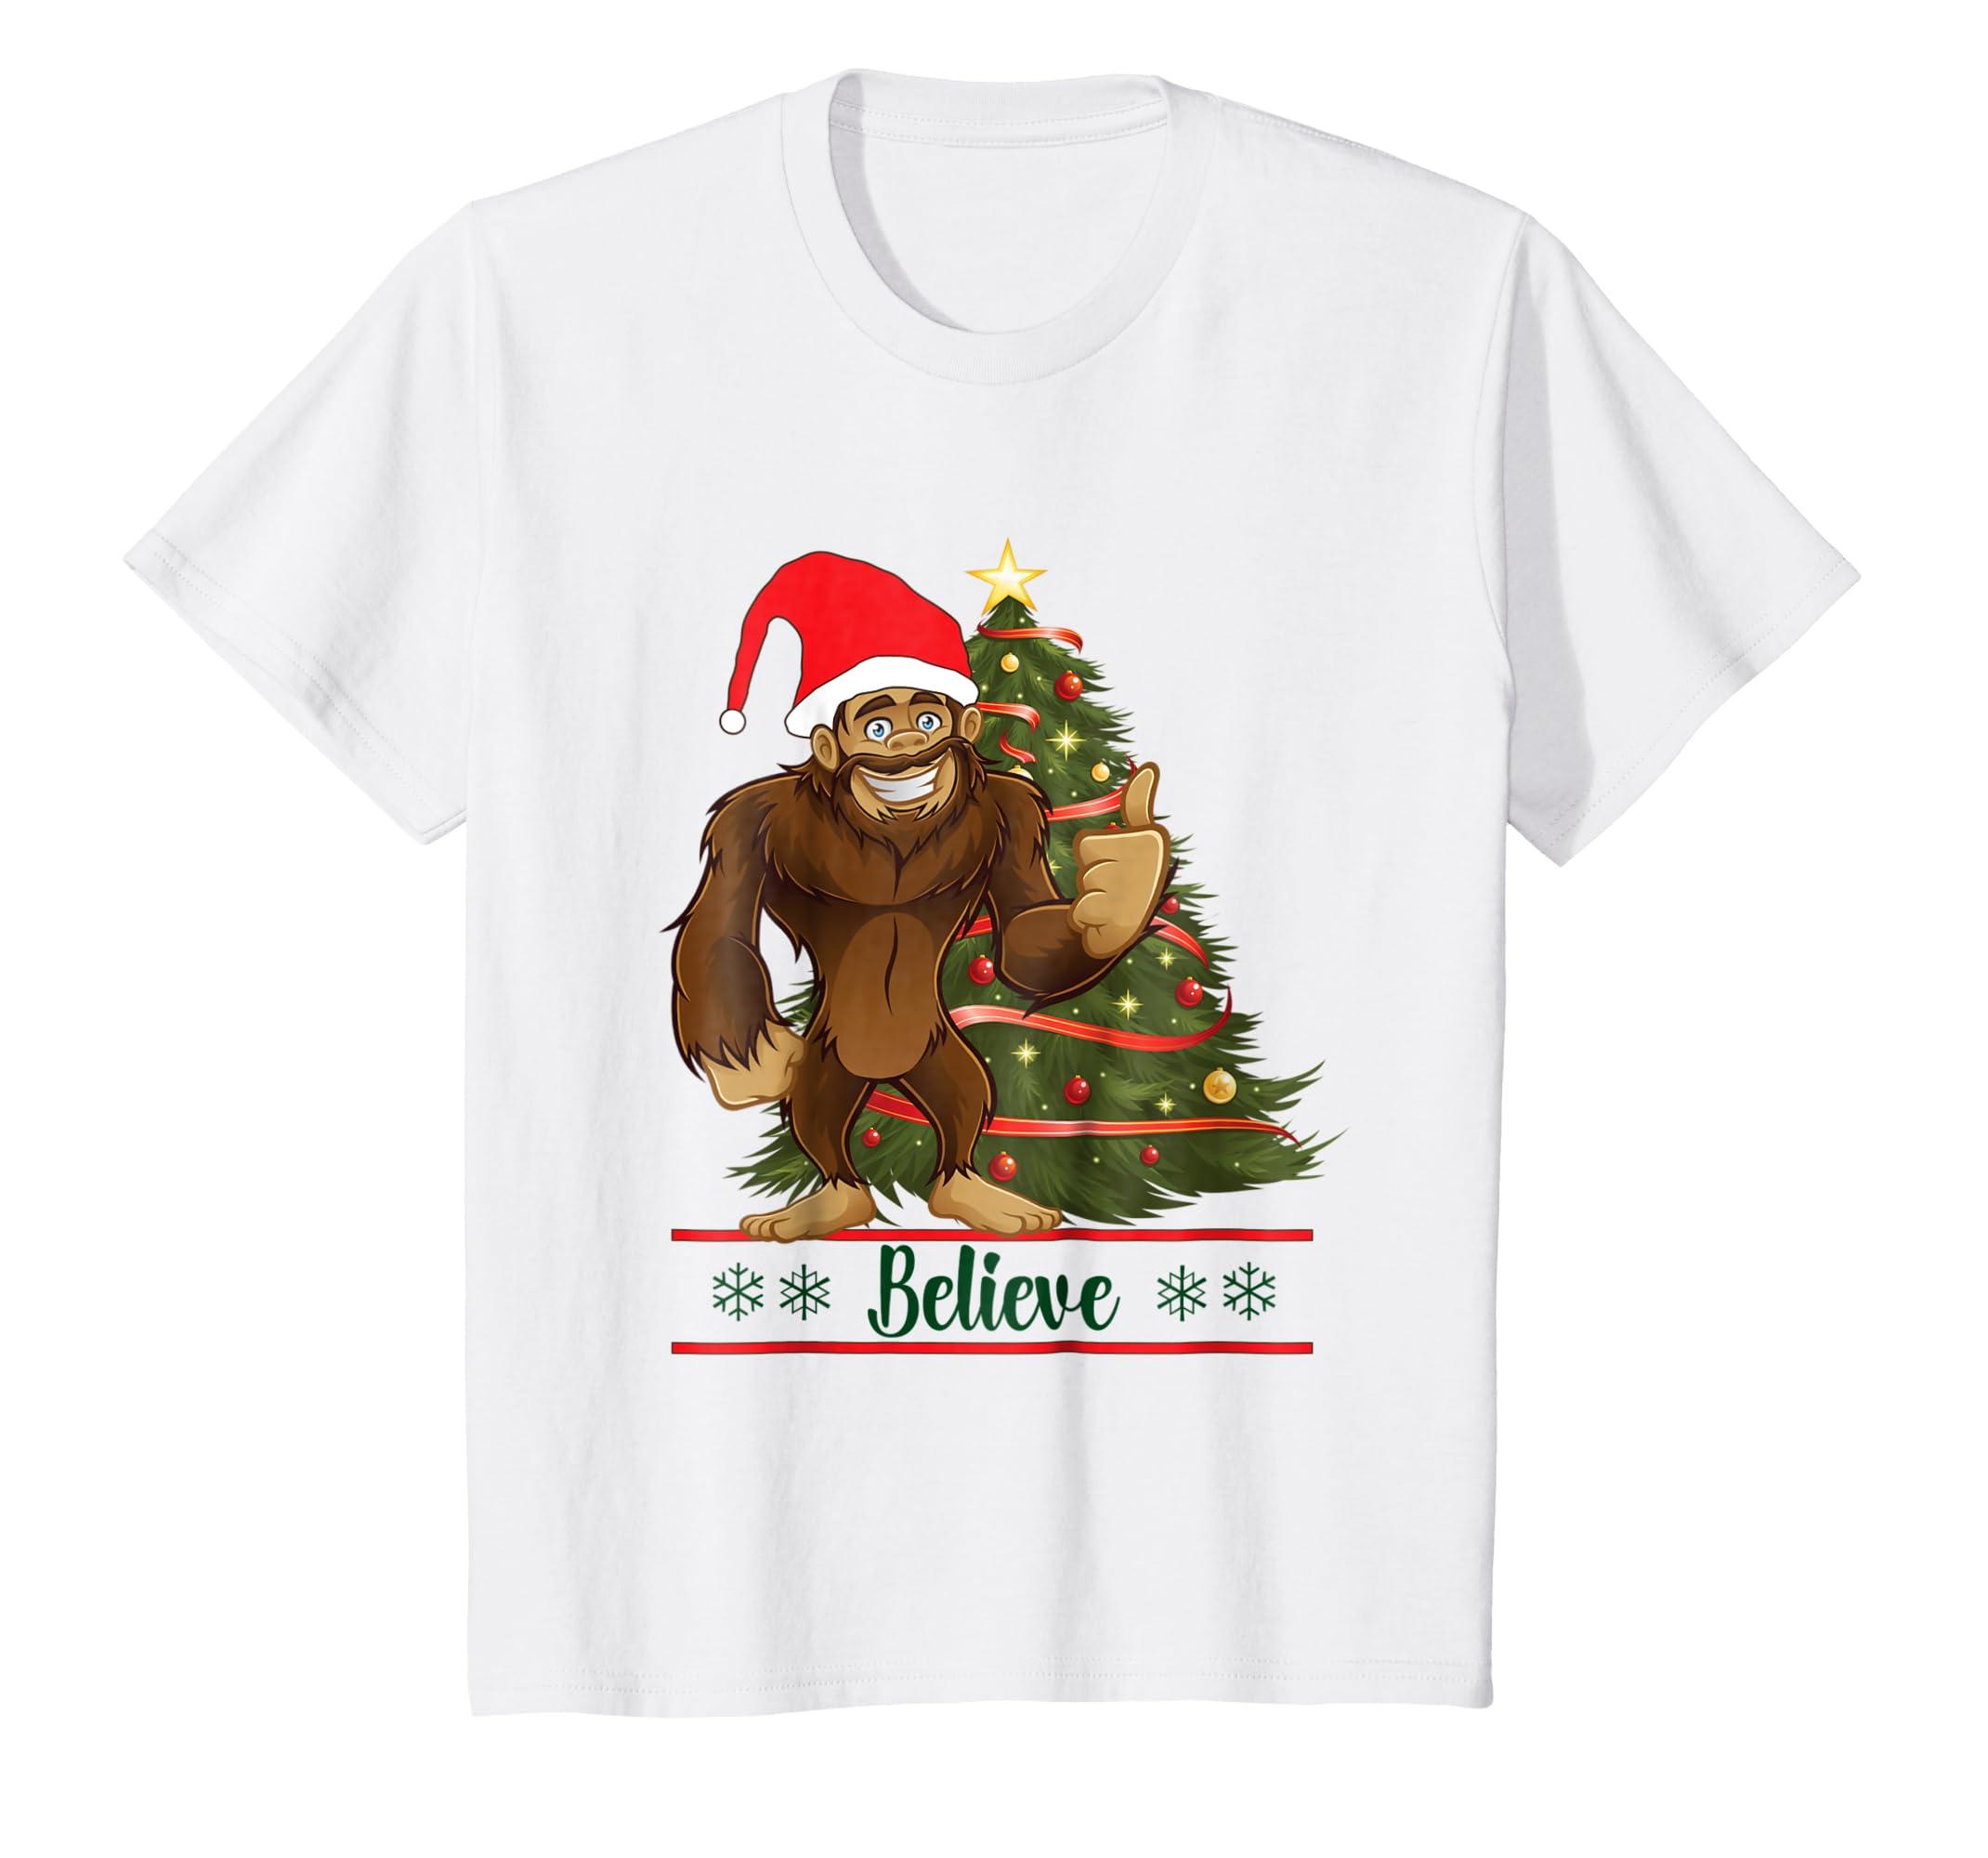 d052f6217d Amazon.com  Bigfoot I Believe Sasquatch Christmas T Shirt Gift tee shirt   Clothing